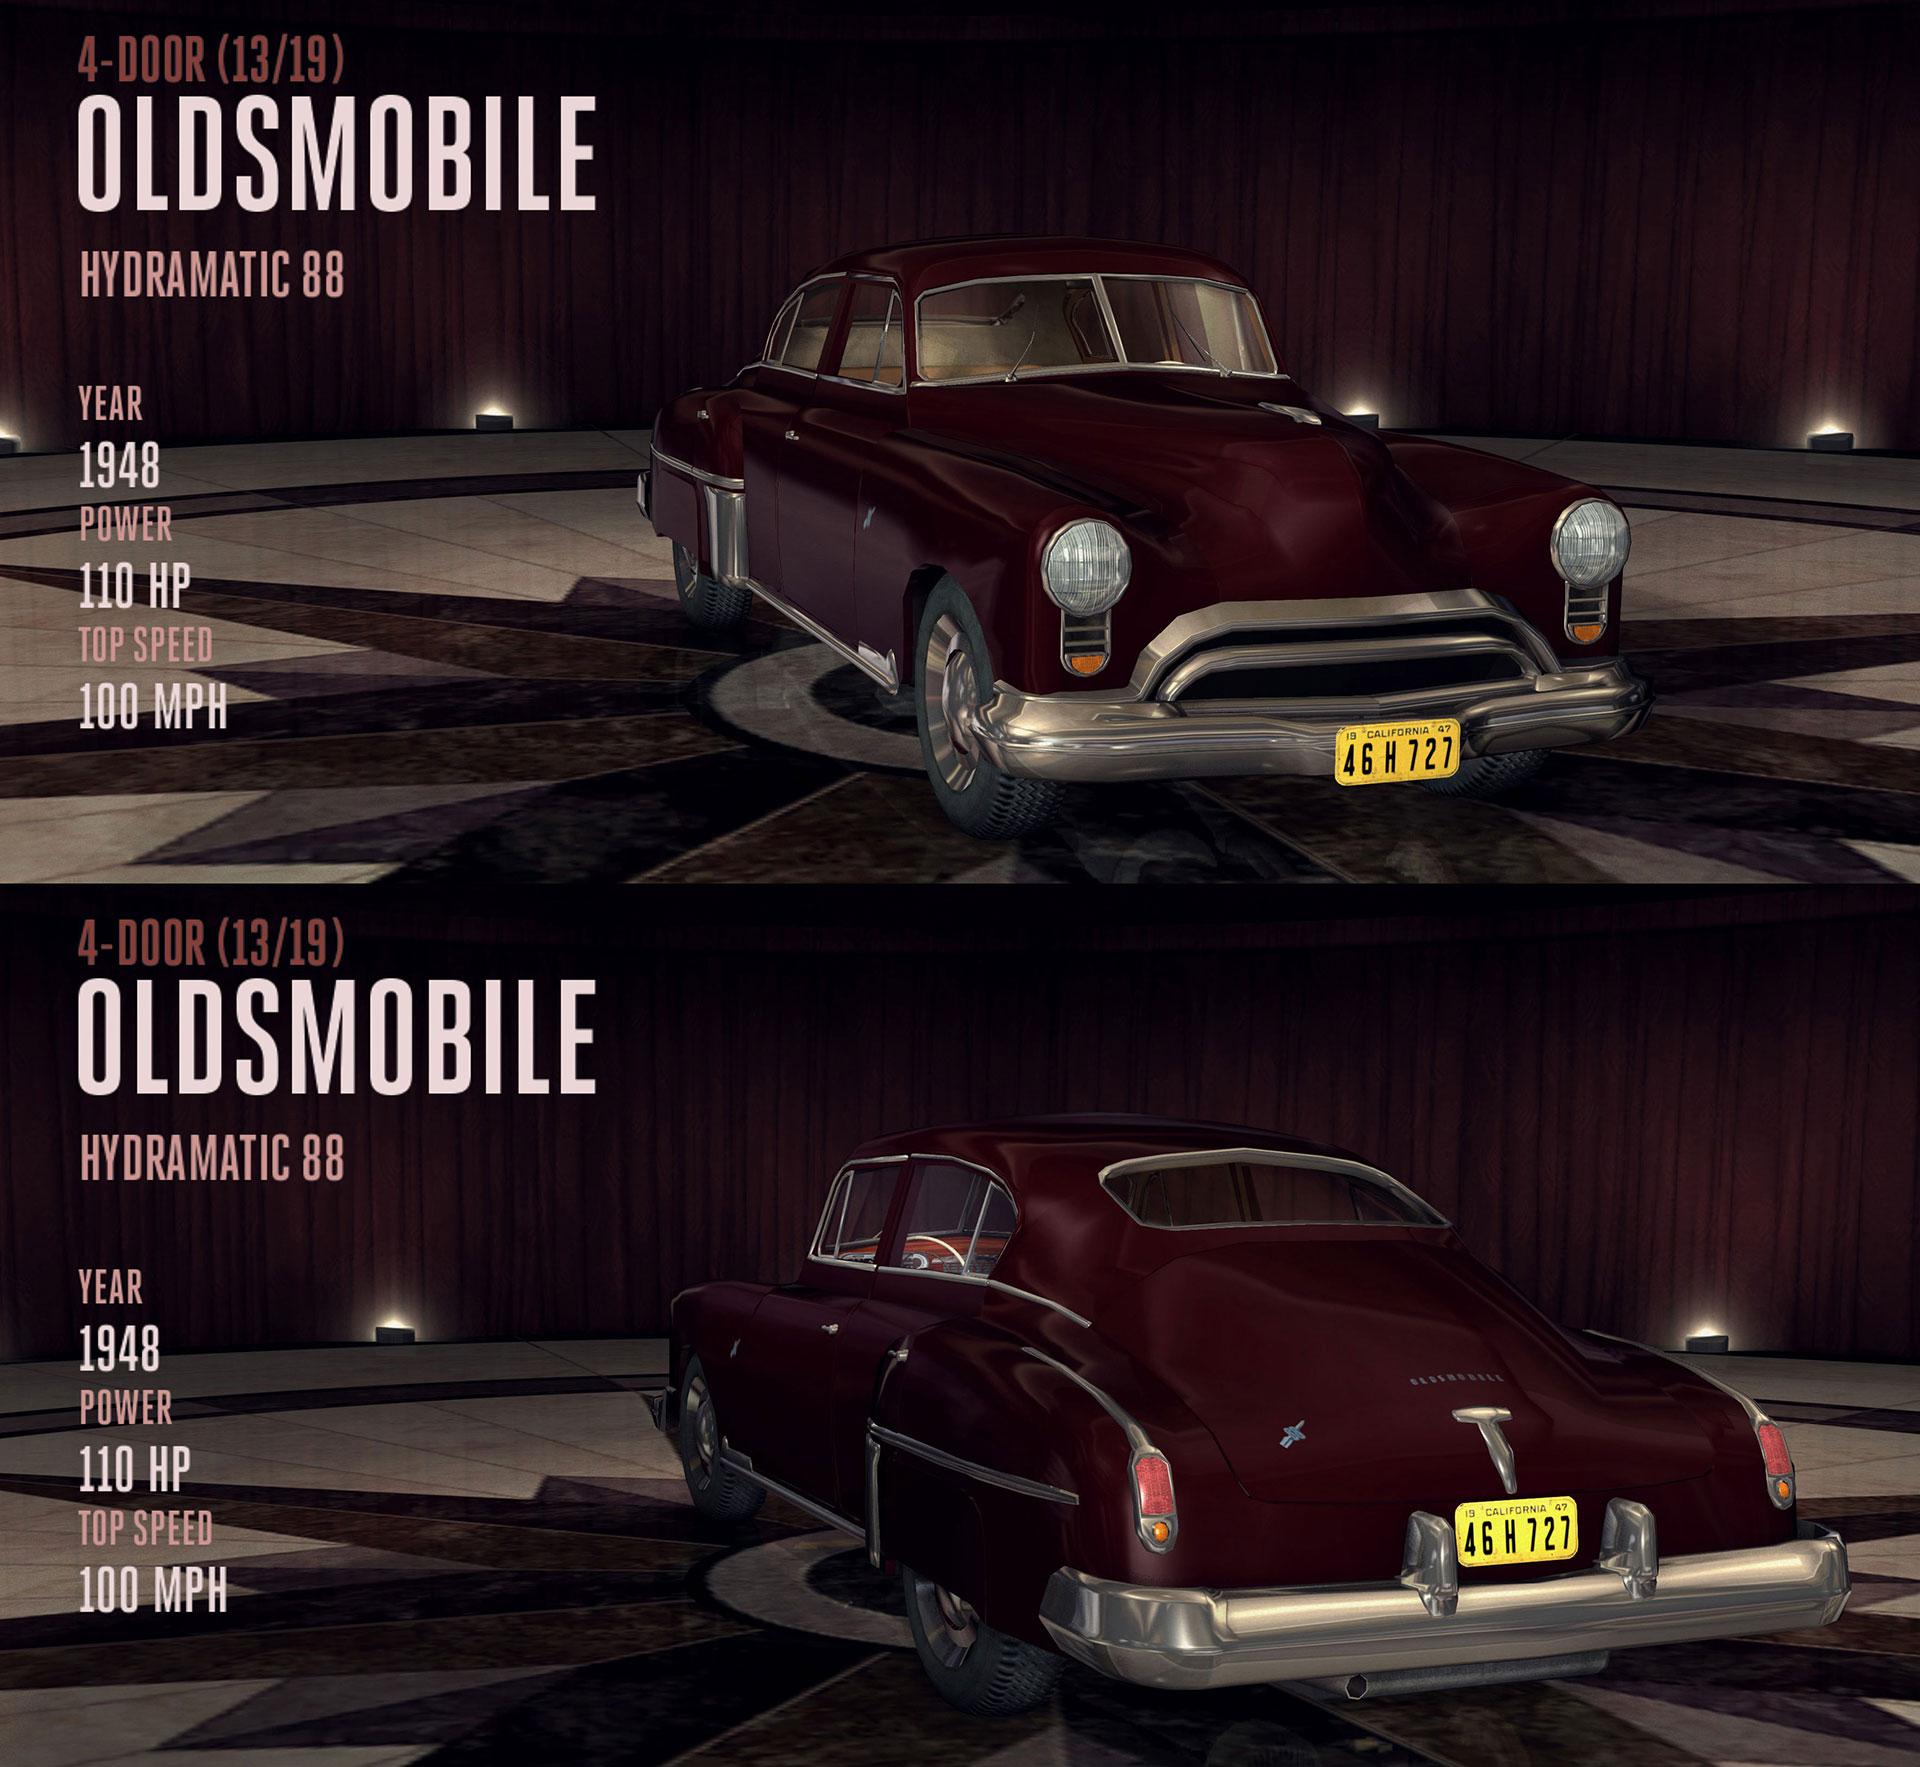 Oldsmobile Hydramatic 88